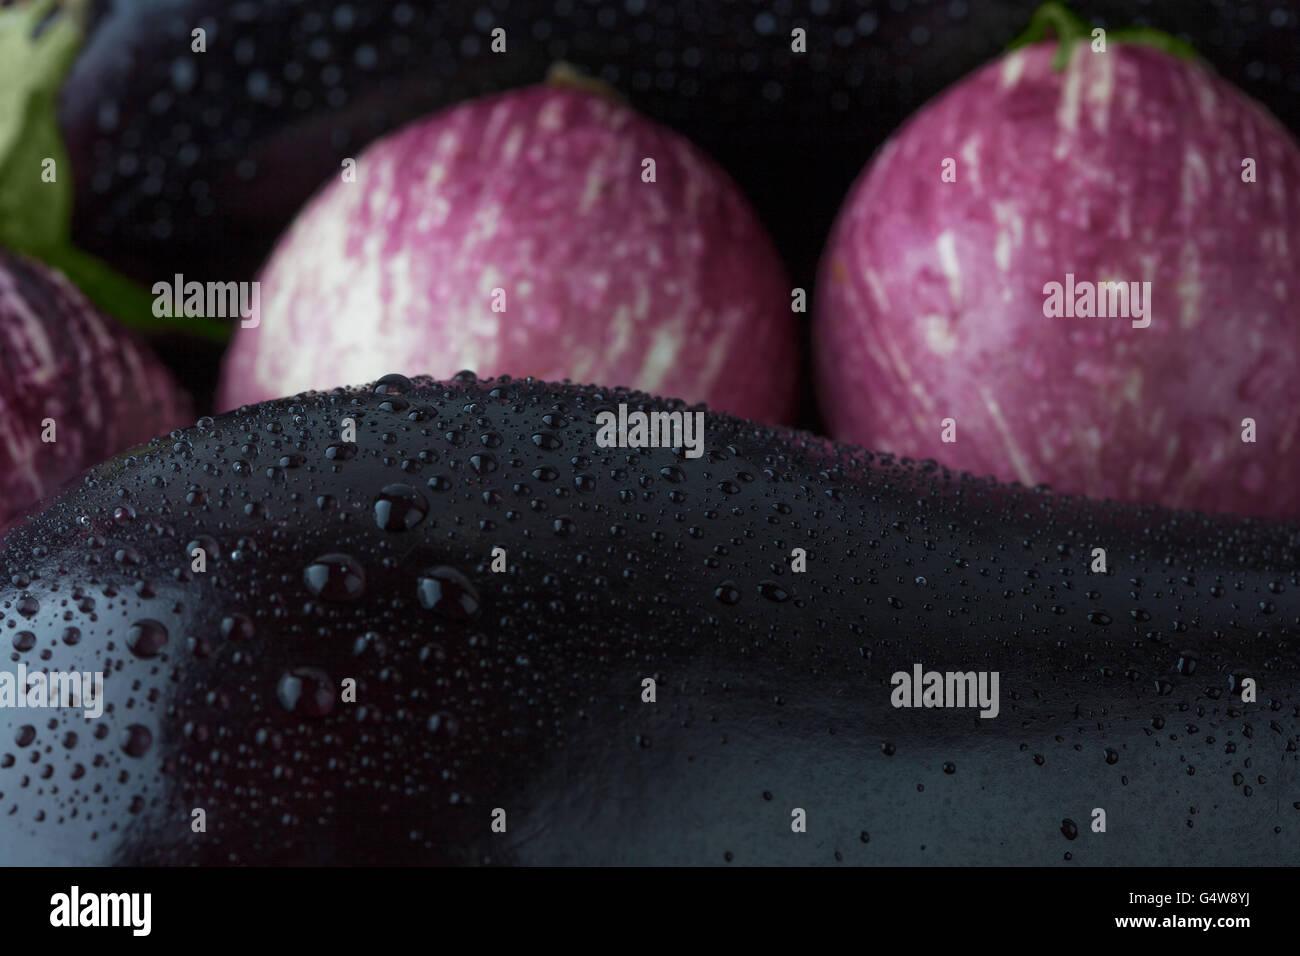 Húmedo y negro a rayas púrpura berenjenas extreme closeup. Profundidad de campo Imagen De Stock